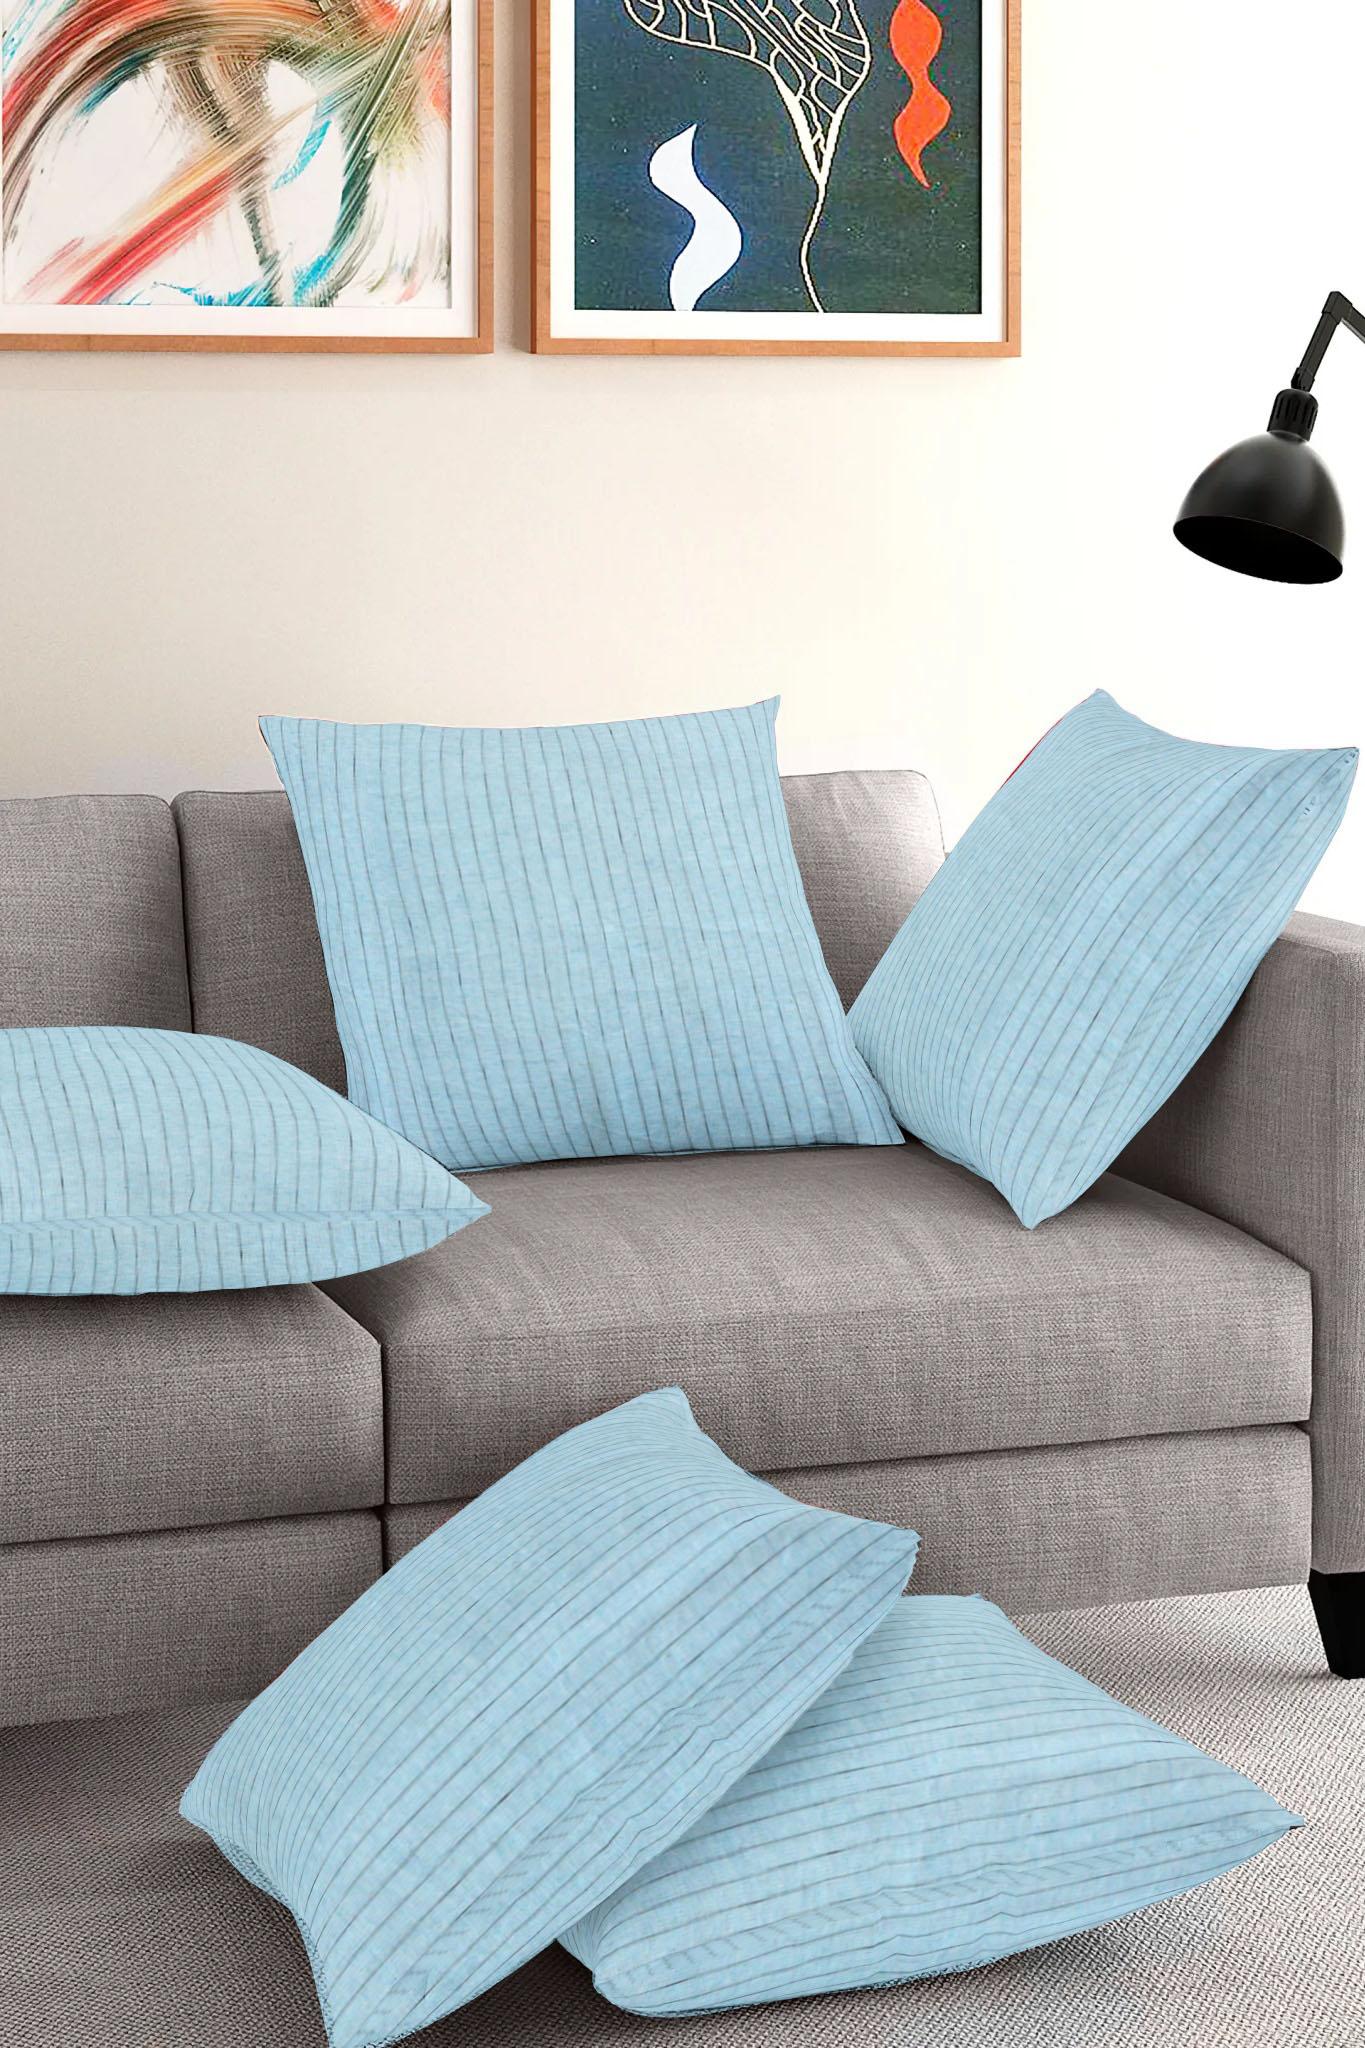 /home/customer/www/fabartcraft.com/public_html/uploadshttps://www.shopolics.com/uploads/images/medium/Cyan-Blue-Cotton-Cushion-Cover-35390.jpg